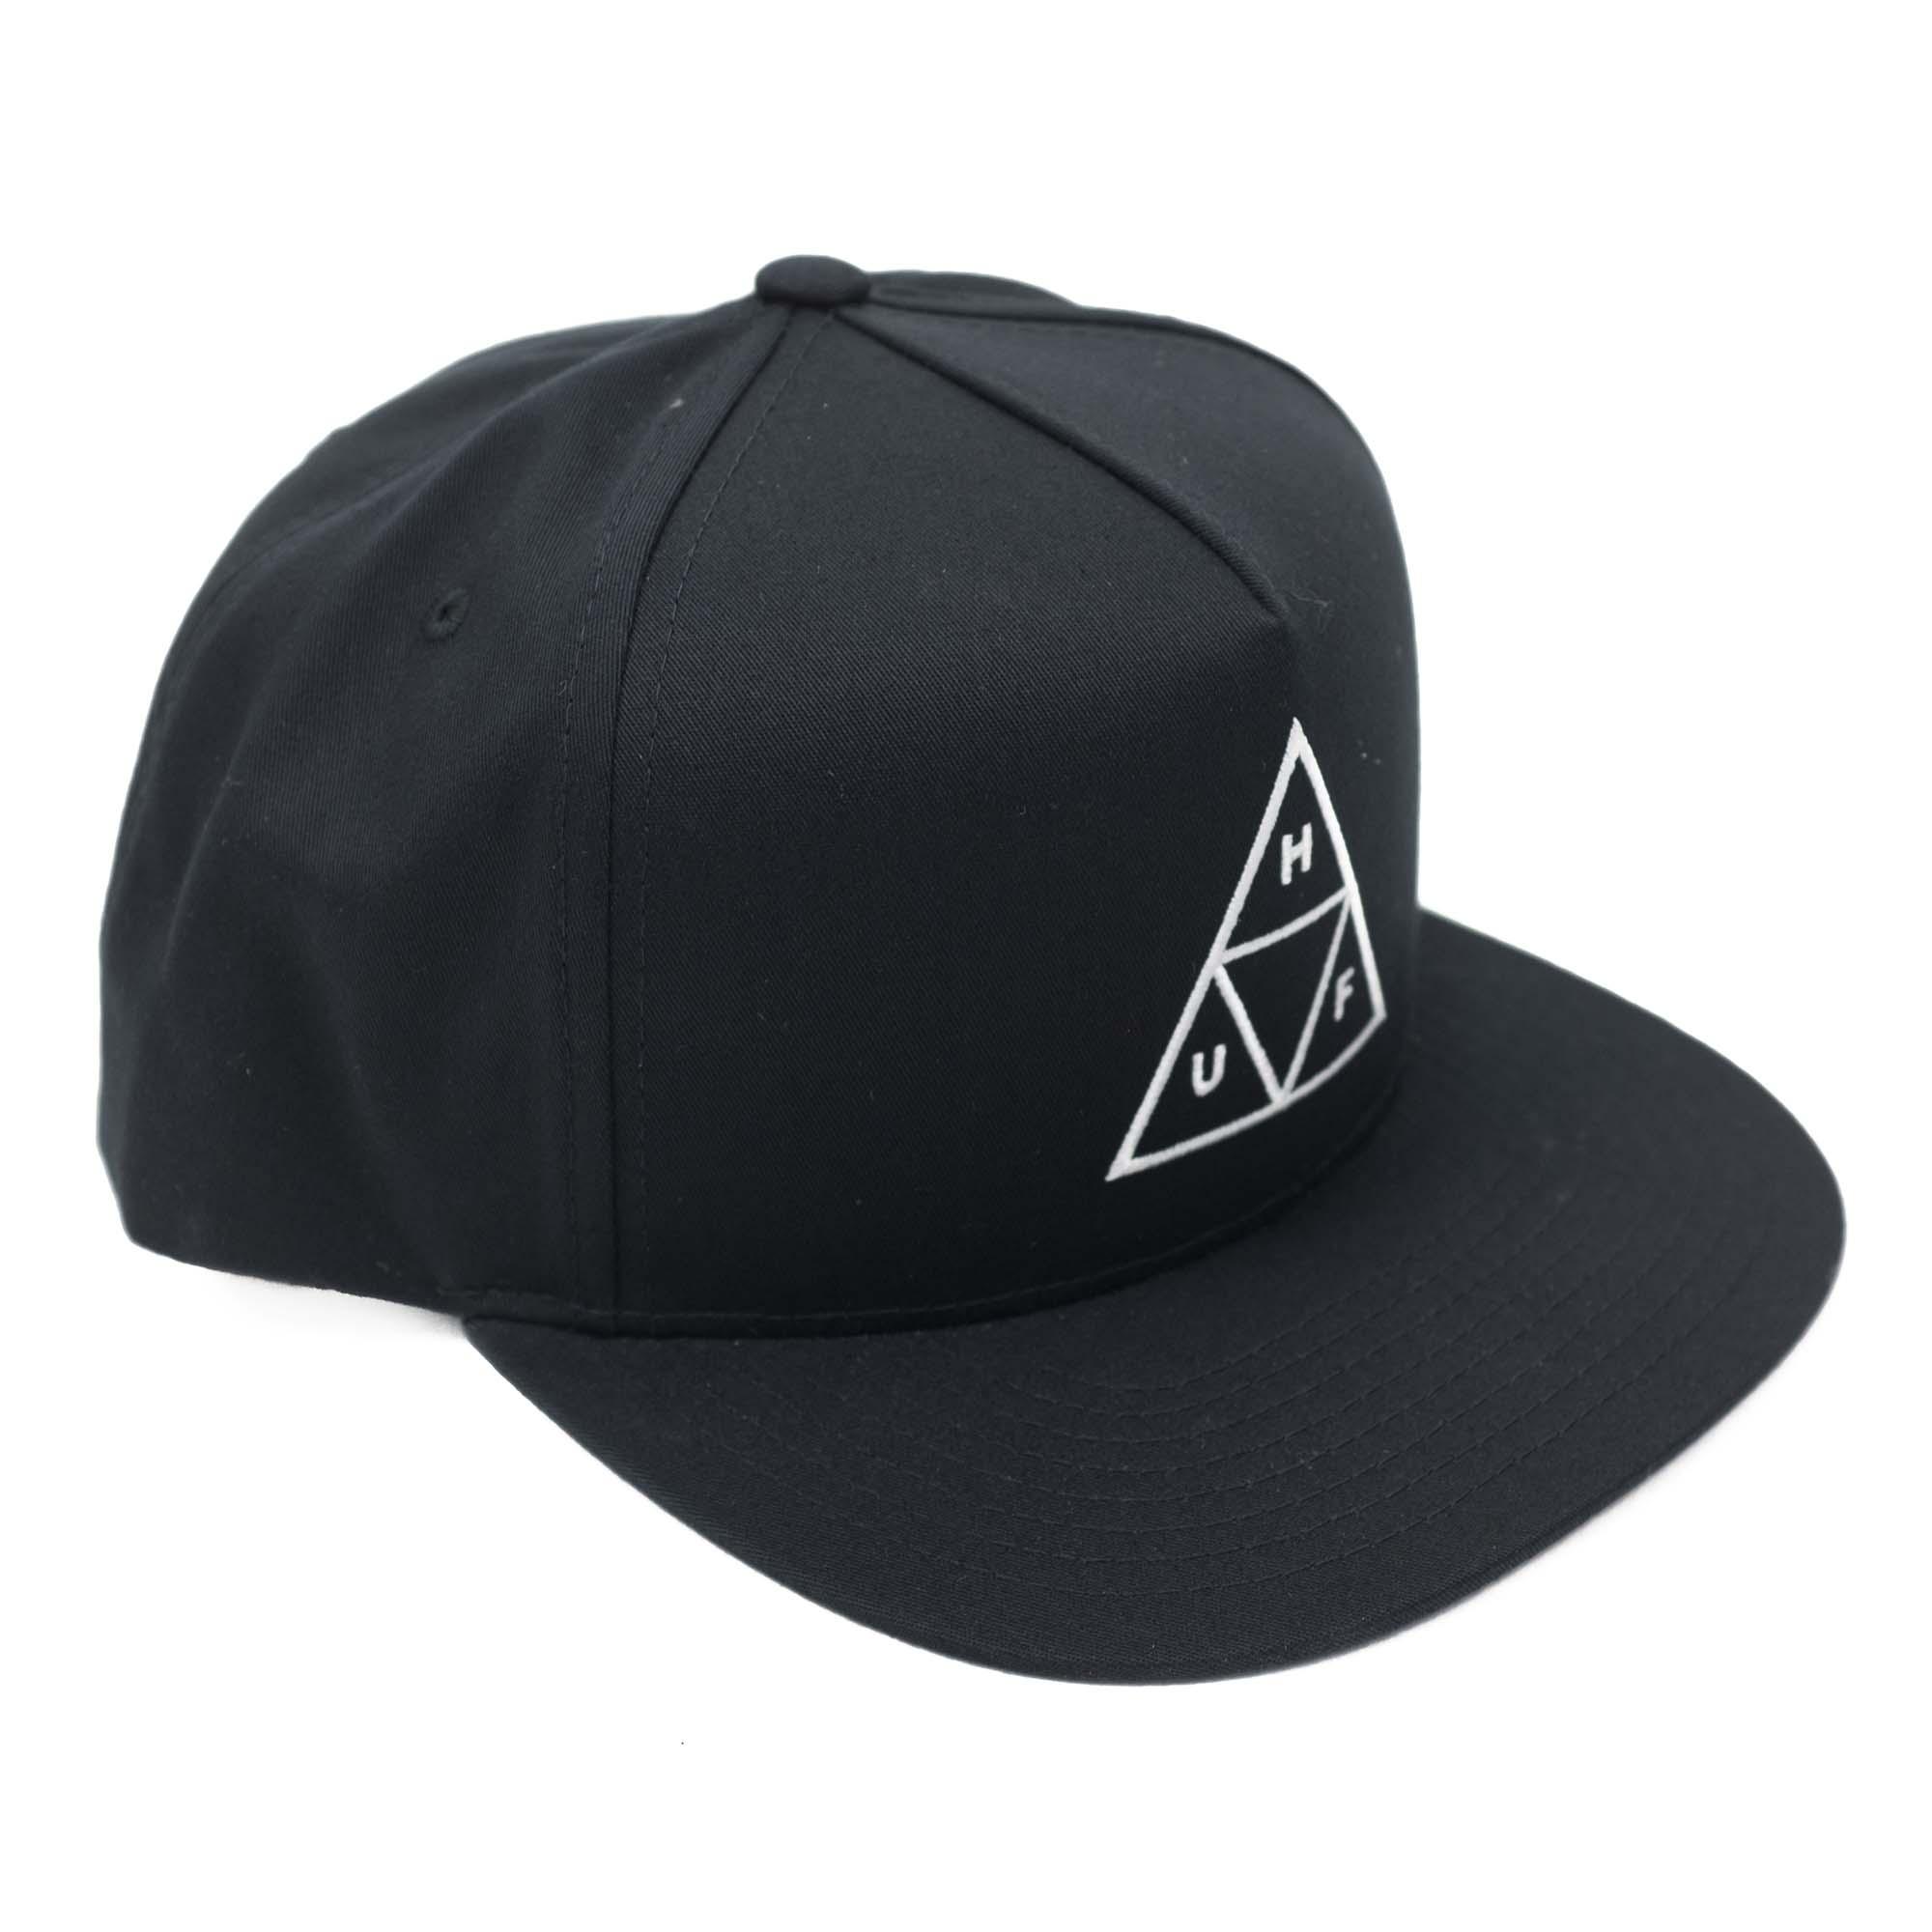 HUF Essentials Tt Snapback Hat - Black